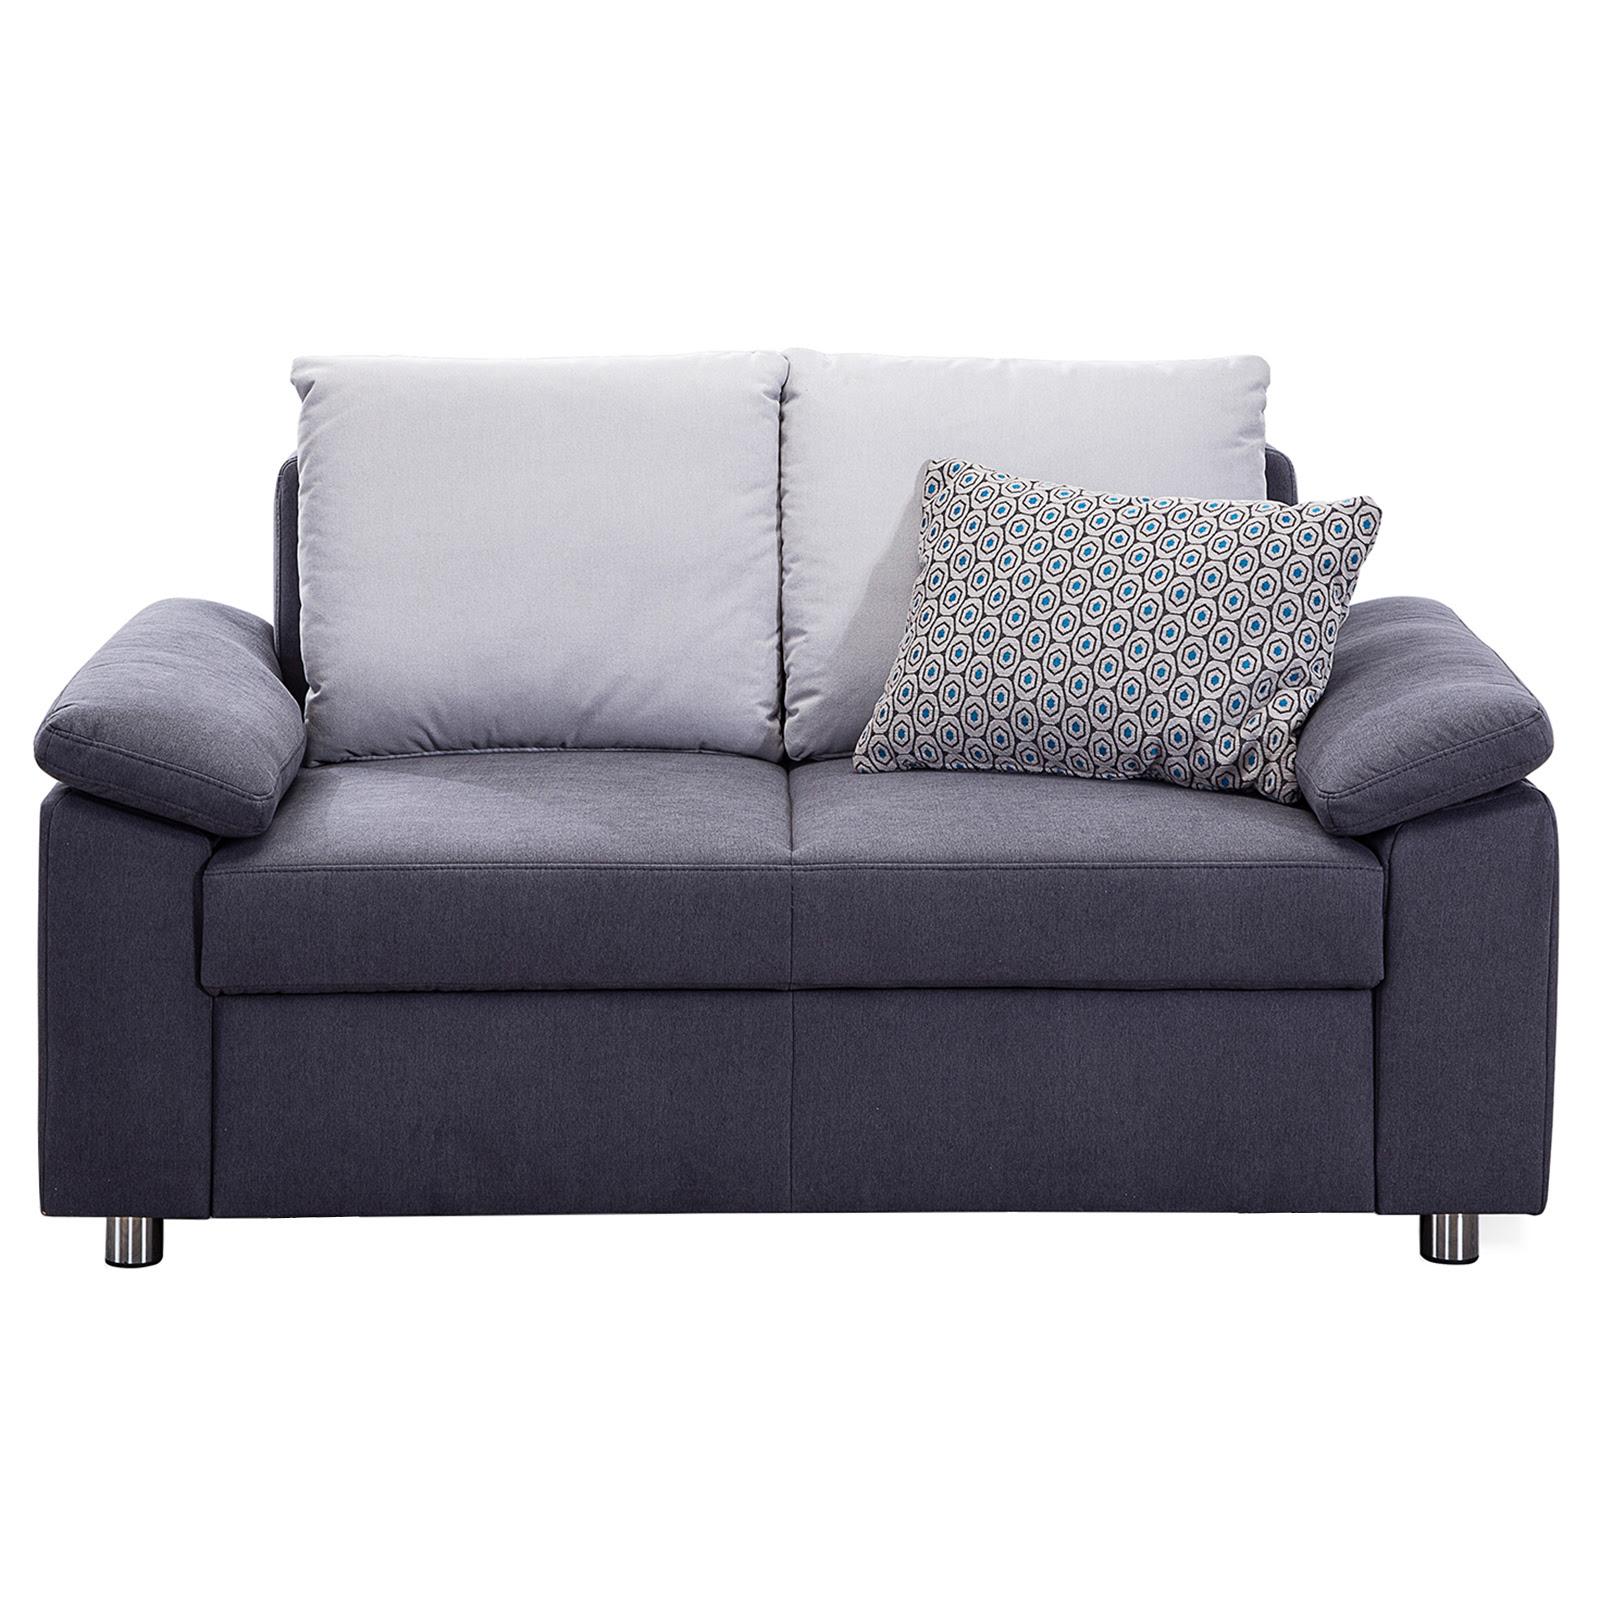 2 Sitzer Sofa Stressless Buckingham L Hoch Black Natur ...